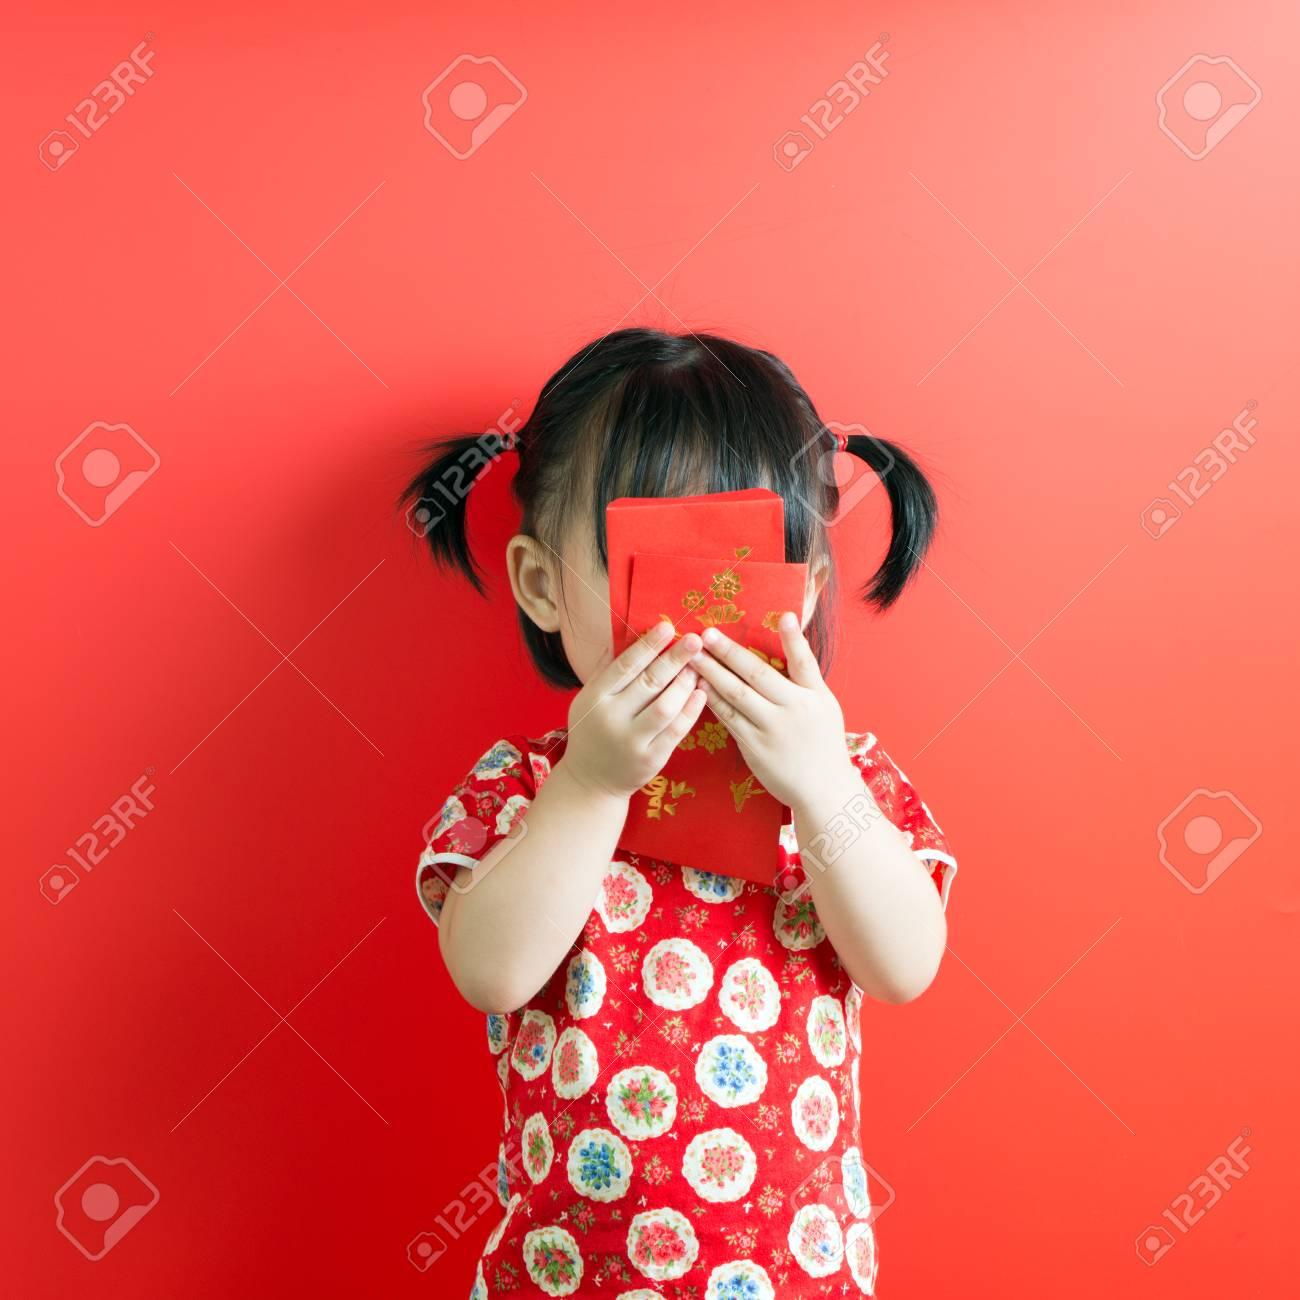 Little Asian girl holding red envelope on red background - 93215259